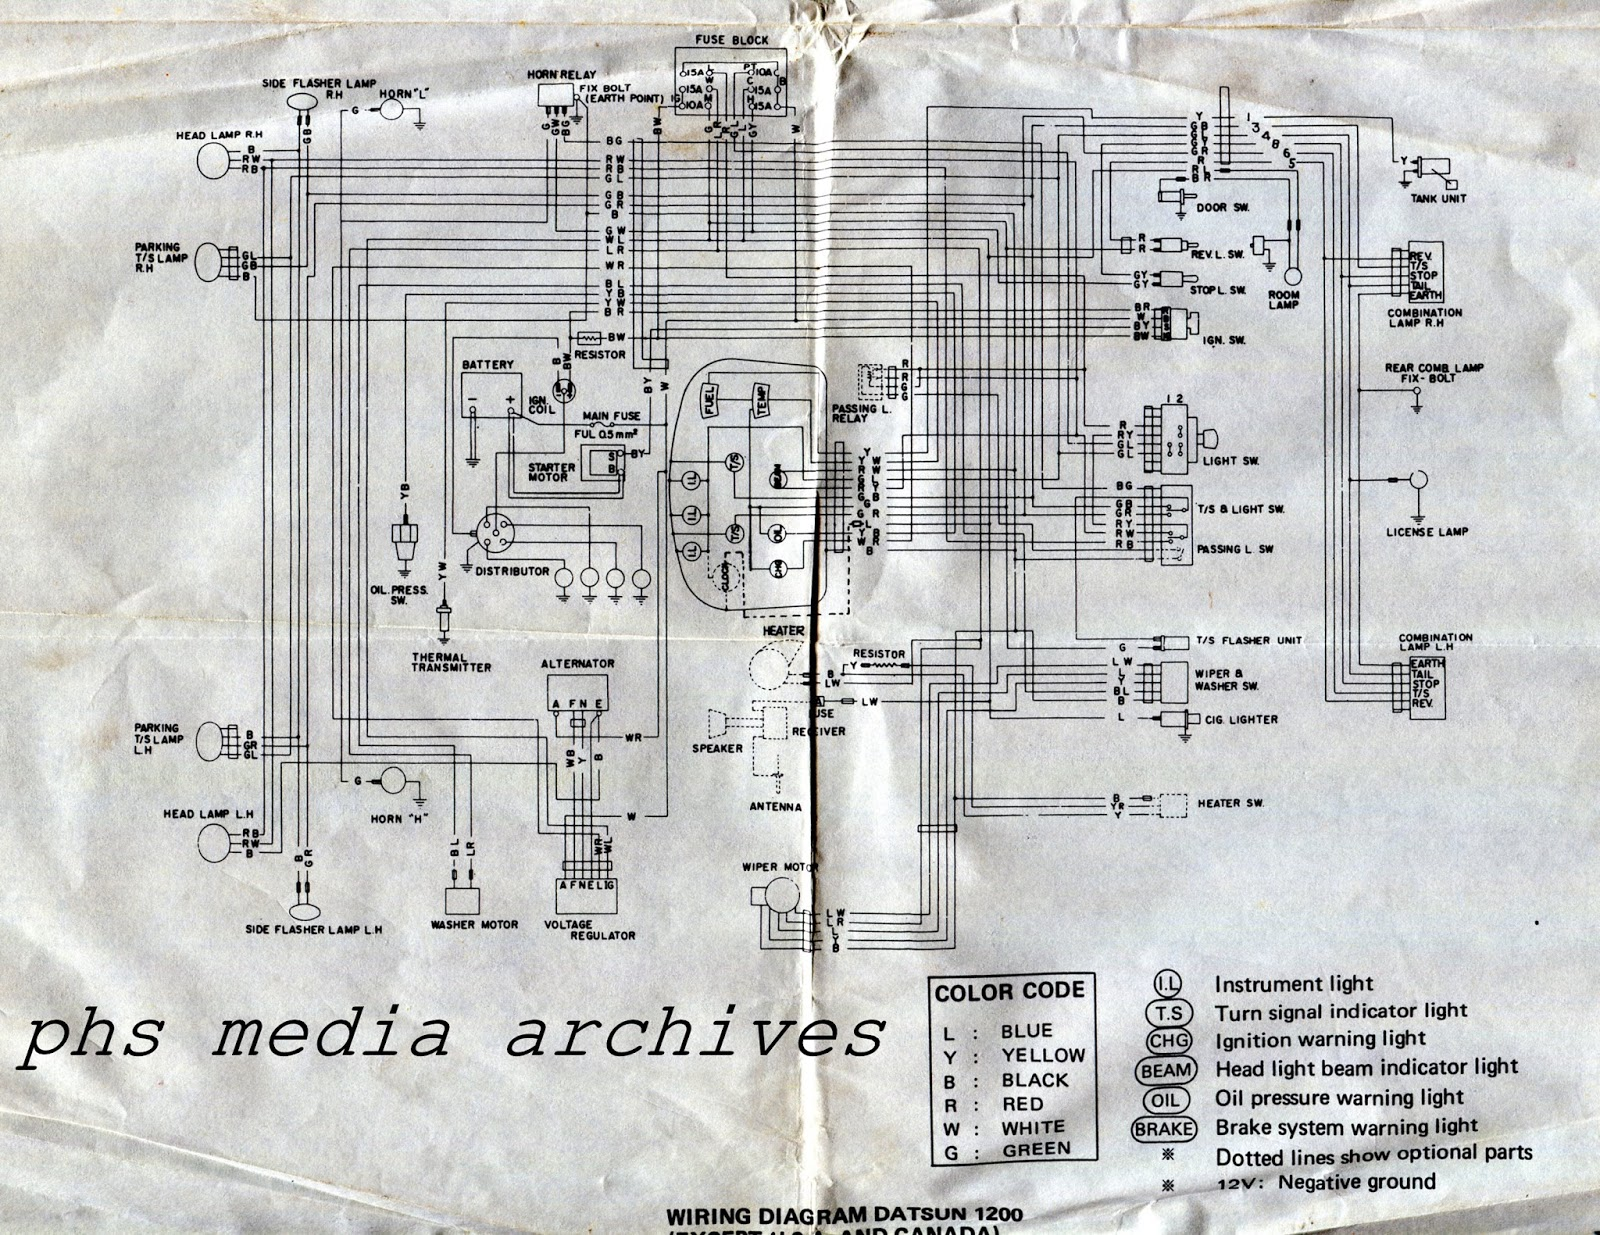 hight resolution of phs tech series 1971 72 datsun 1200 wiring diagrams 3 way switch light wiring diagram